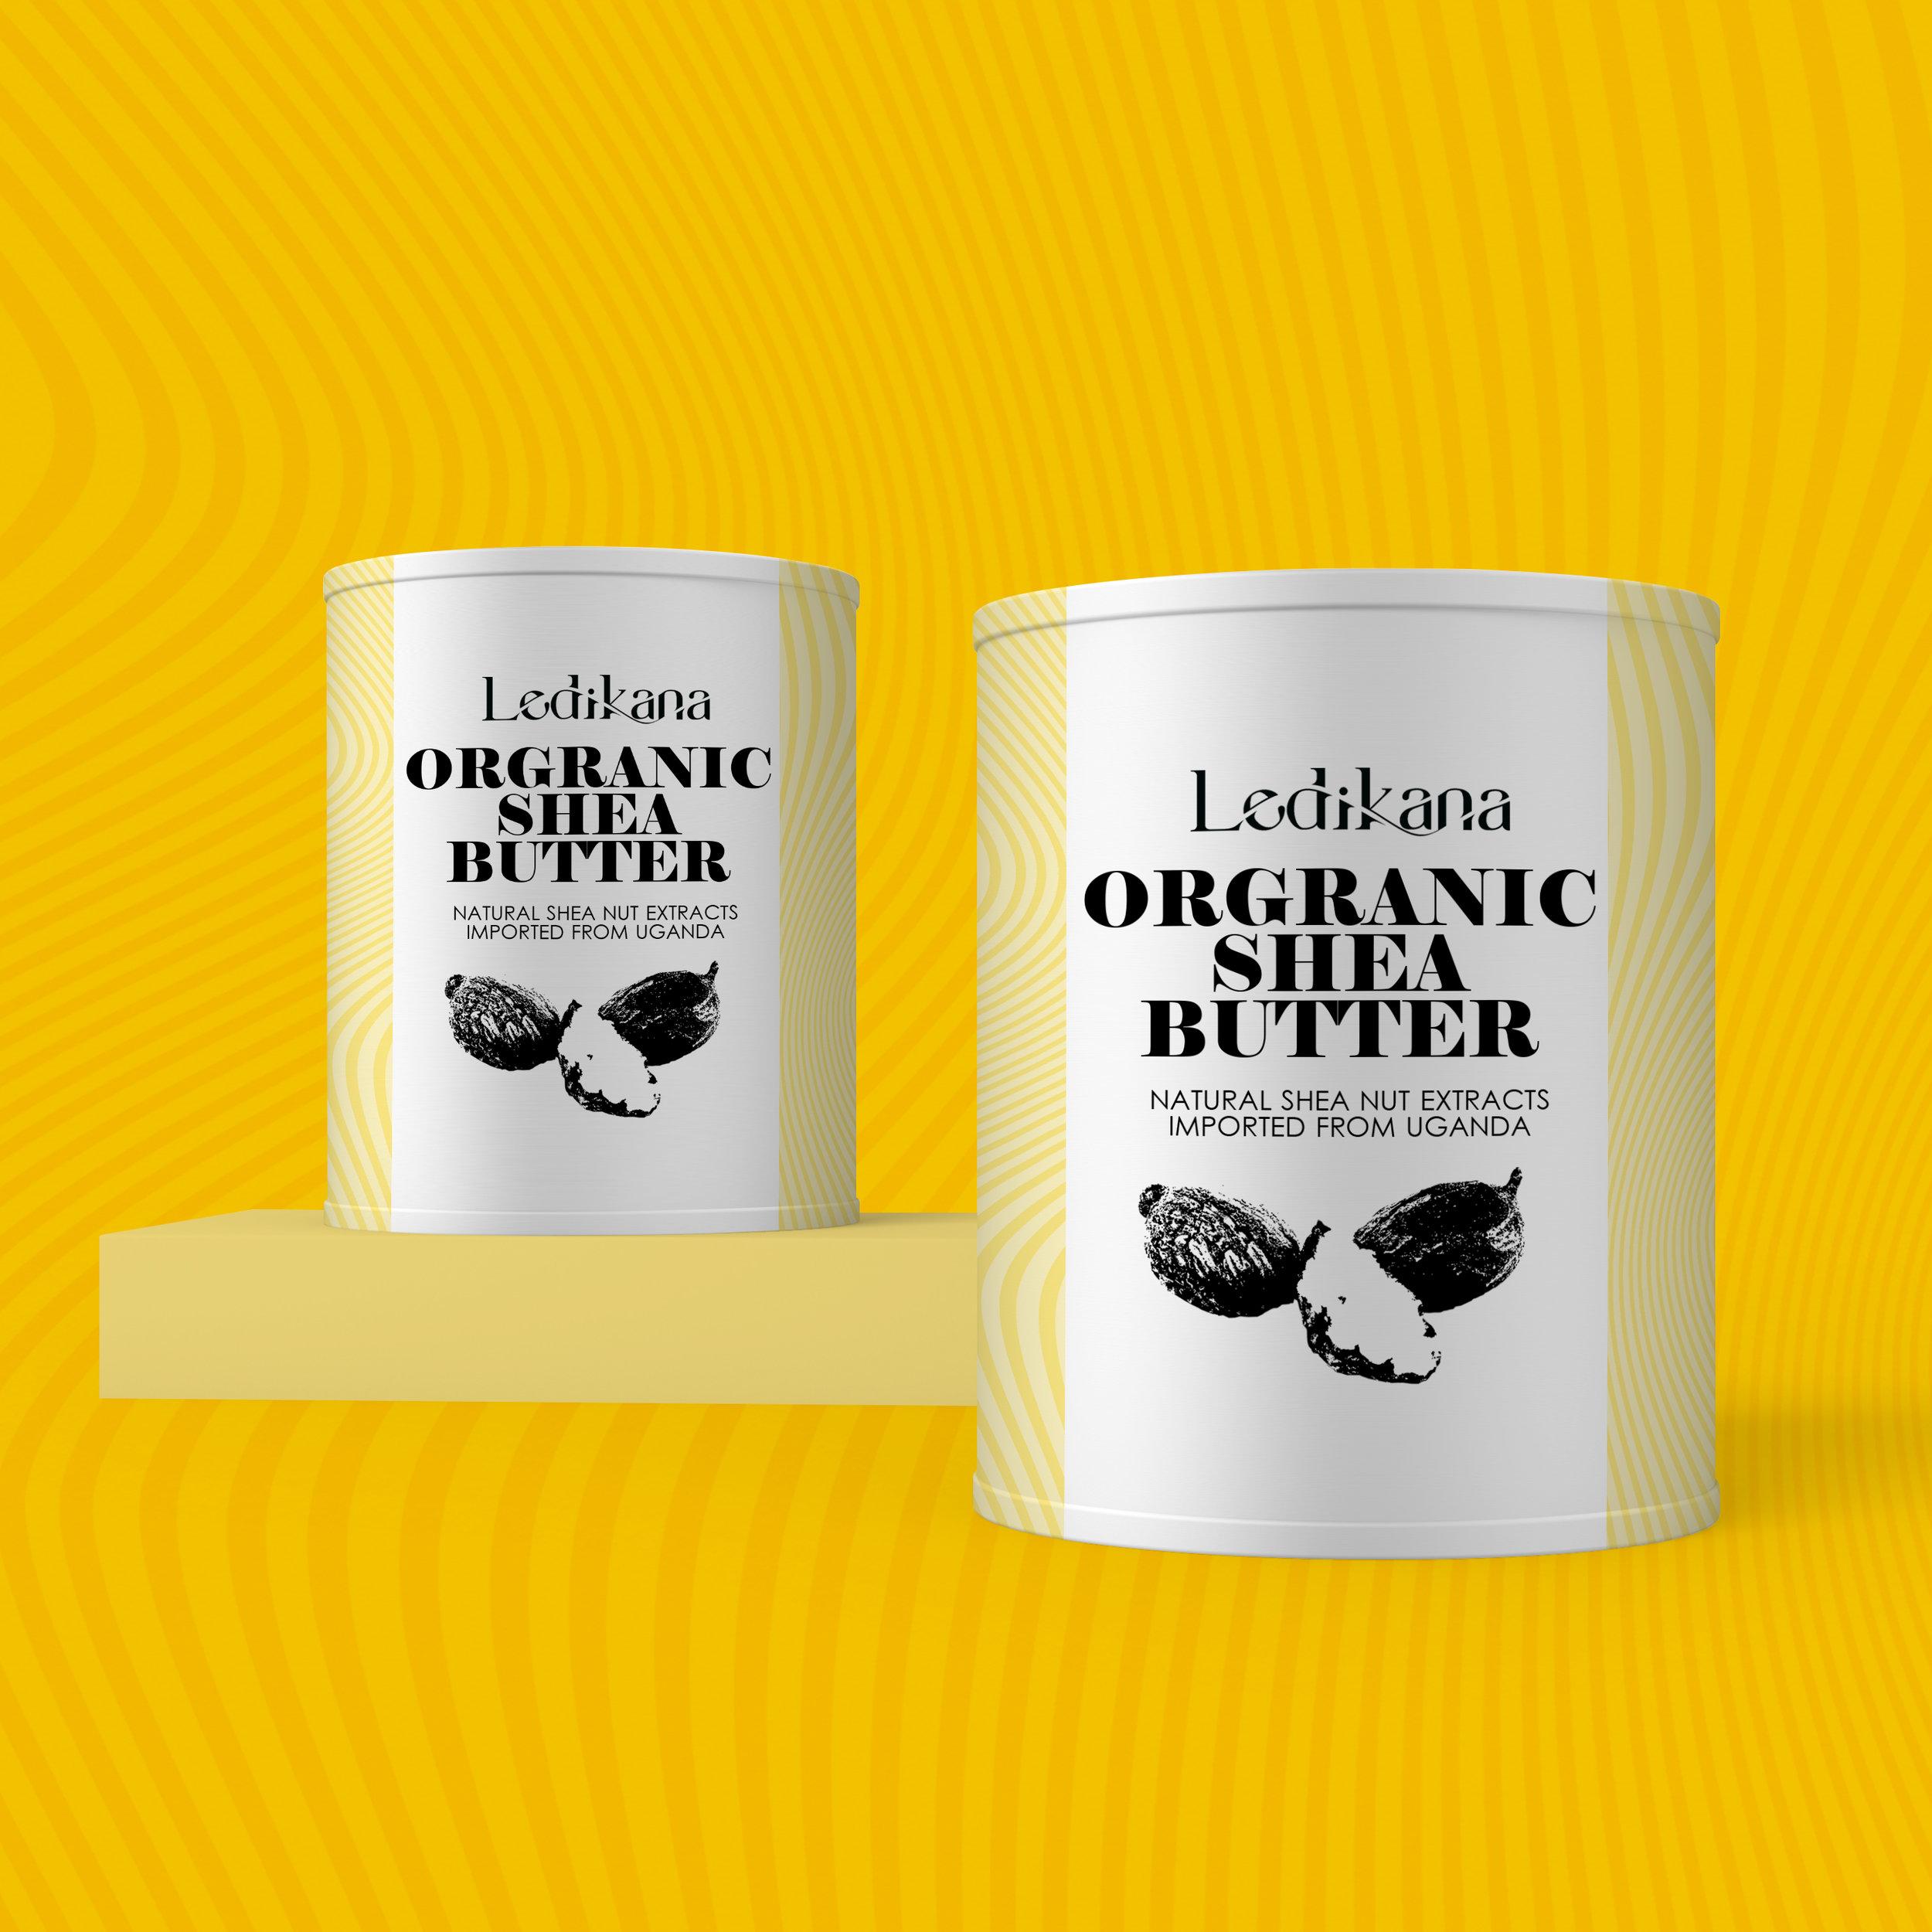 ledikana organic shea butter packaging mock ups